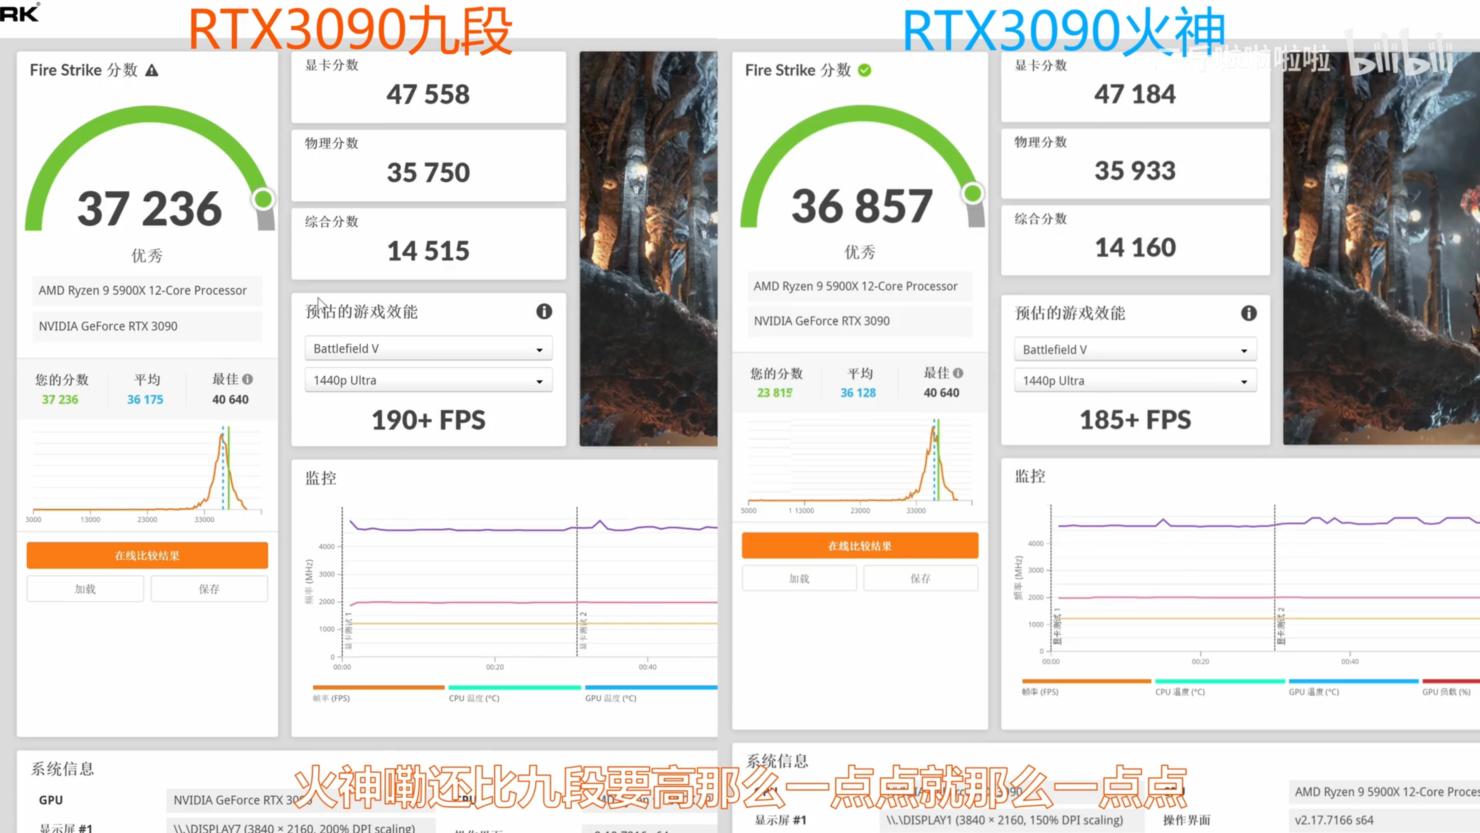 colorful-igame-geforce-rtx-3090-kudan-graphics-card-benchmarks-_4